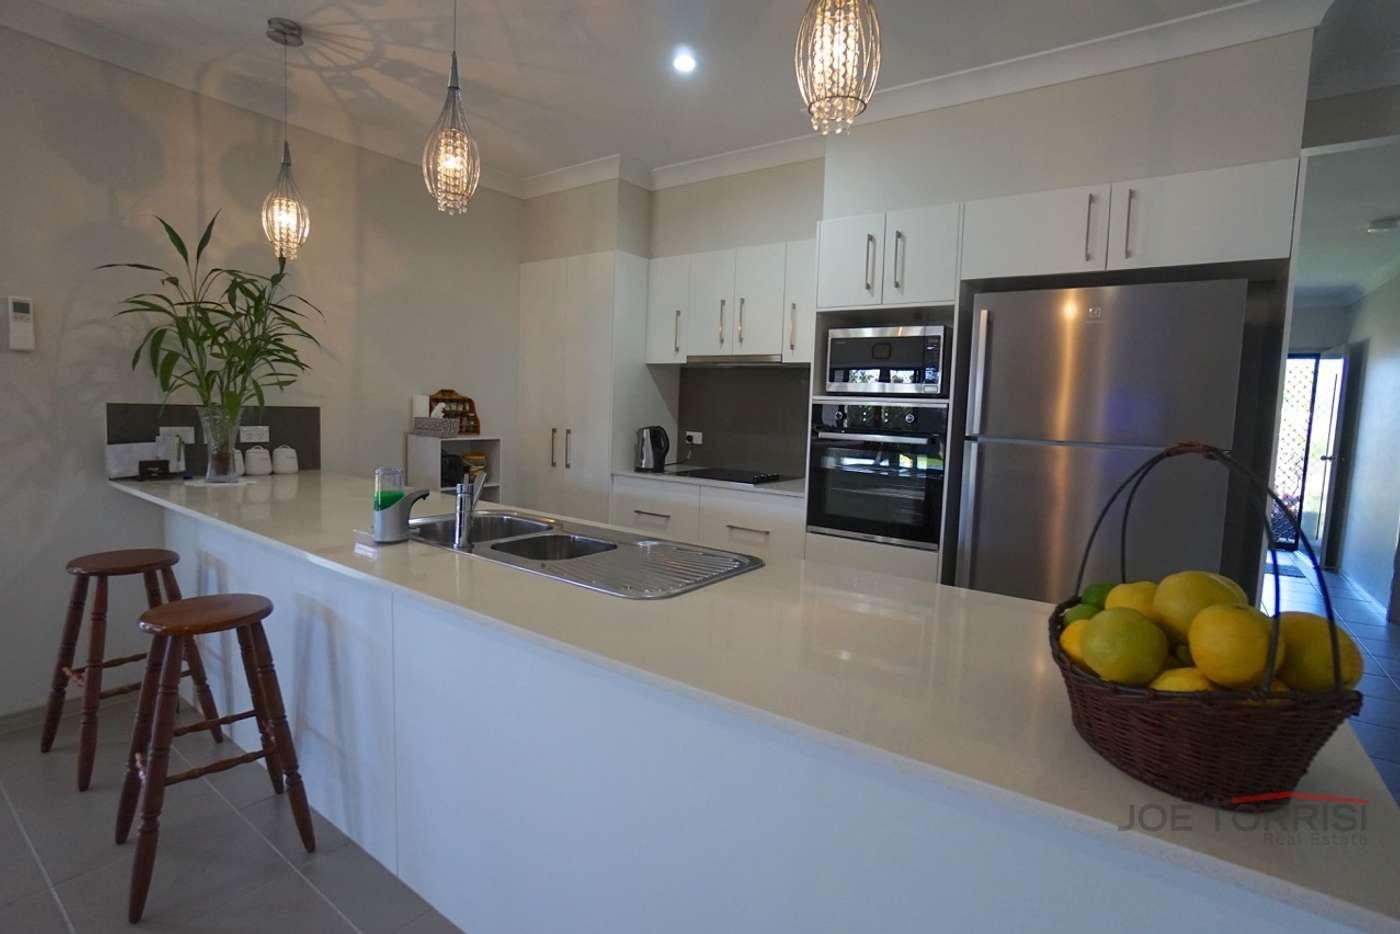 Sixth view of Homely house listing, 88 Hoolahan Drive, Mareeba QLD 4880